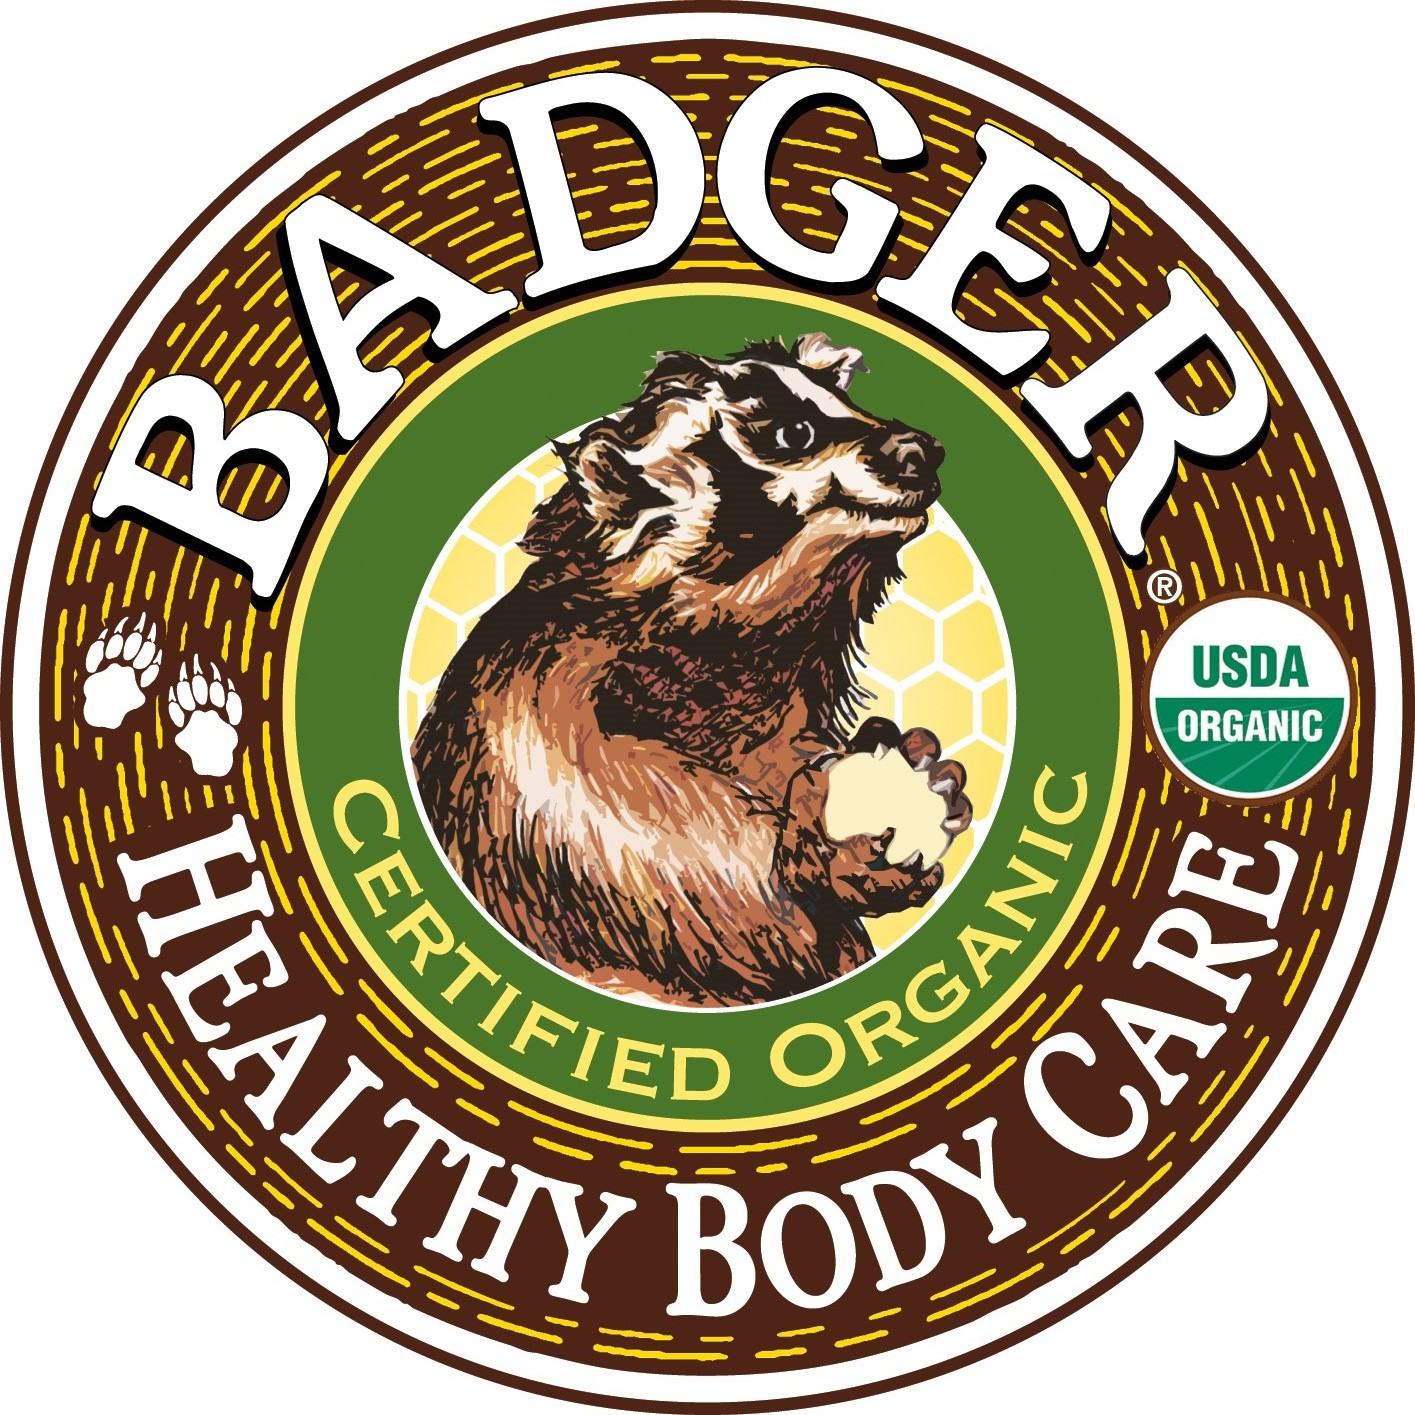 badger care skin face balm badgers organic oils line company balms beauty babies usda badgerbalm business oil sunscreen salve efficacy